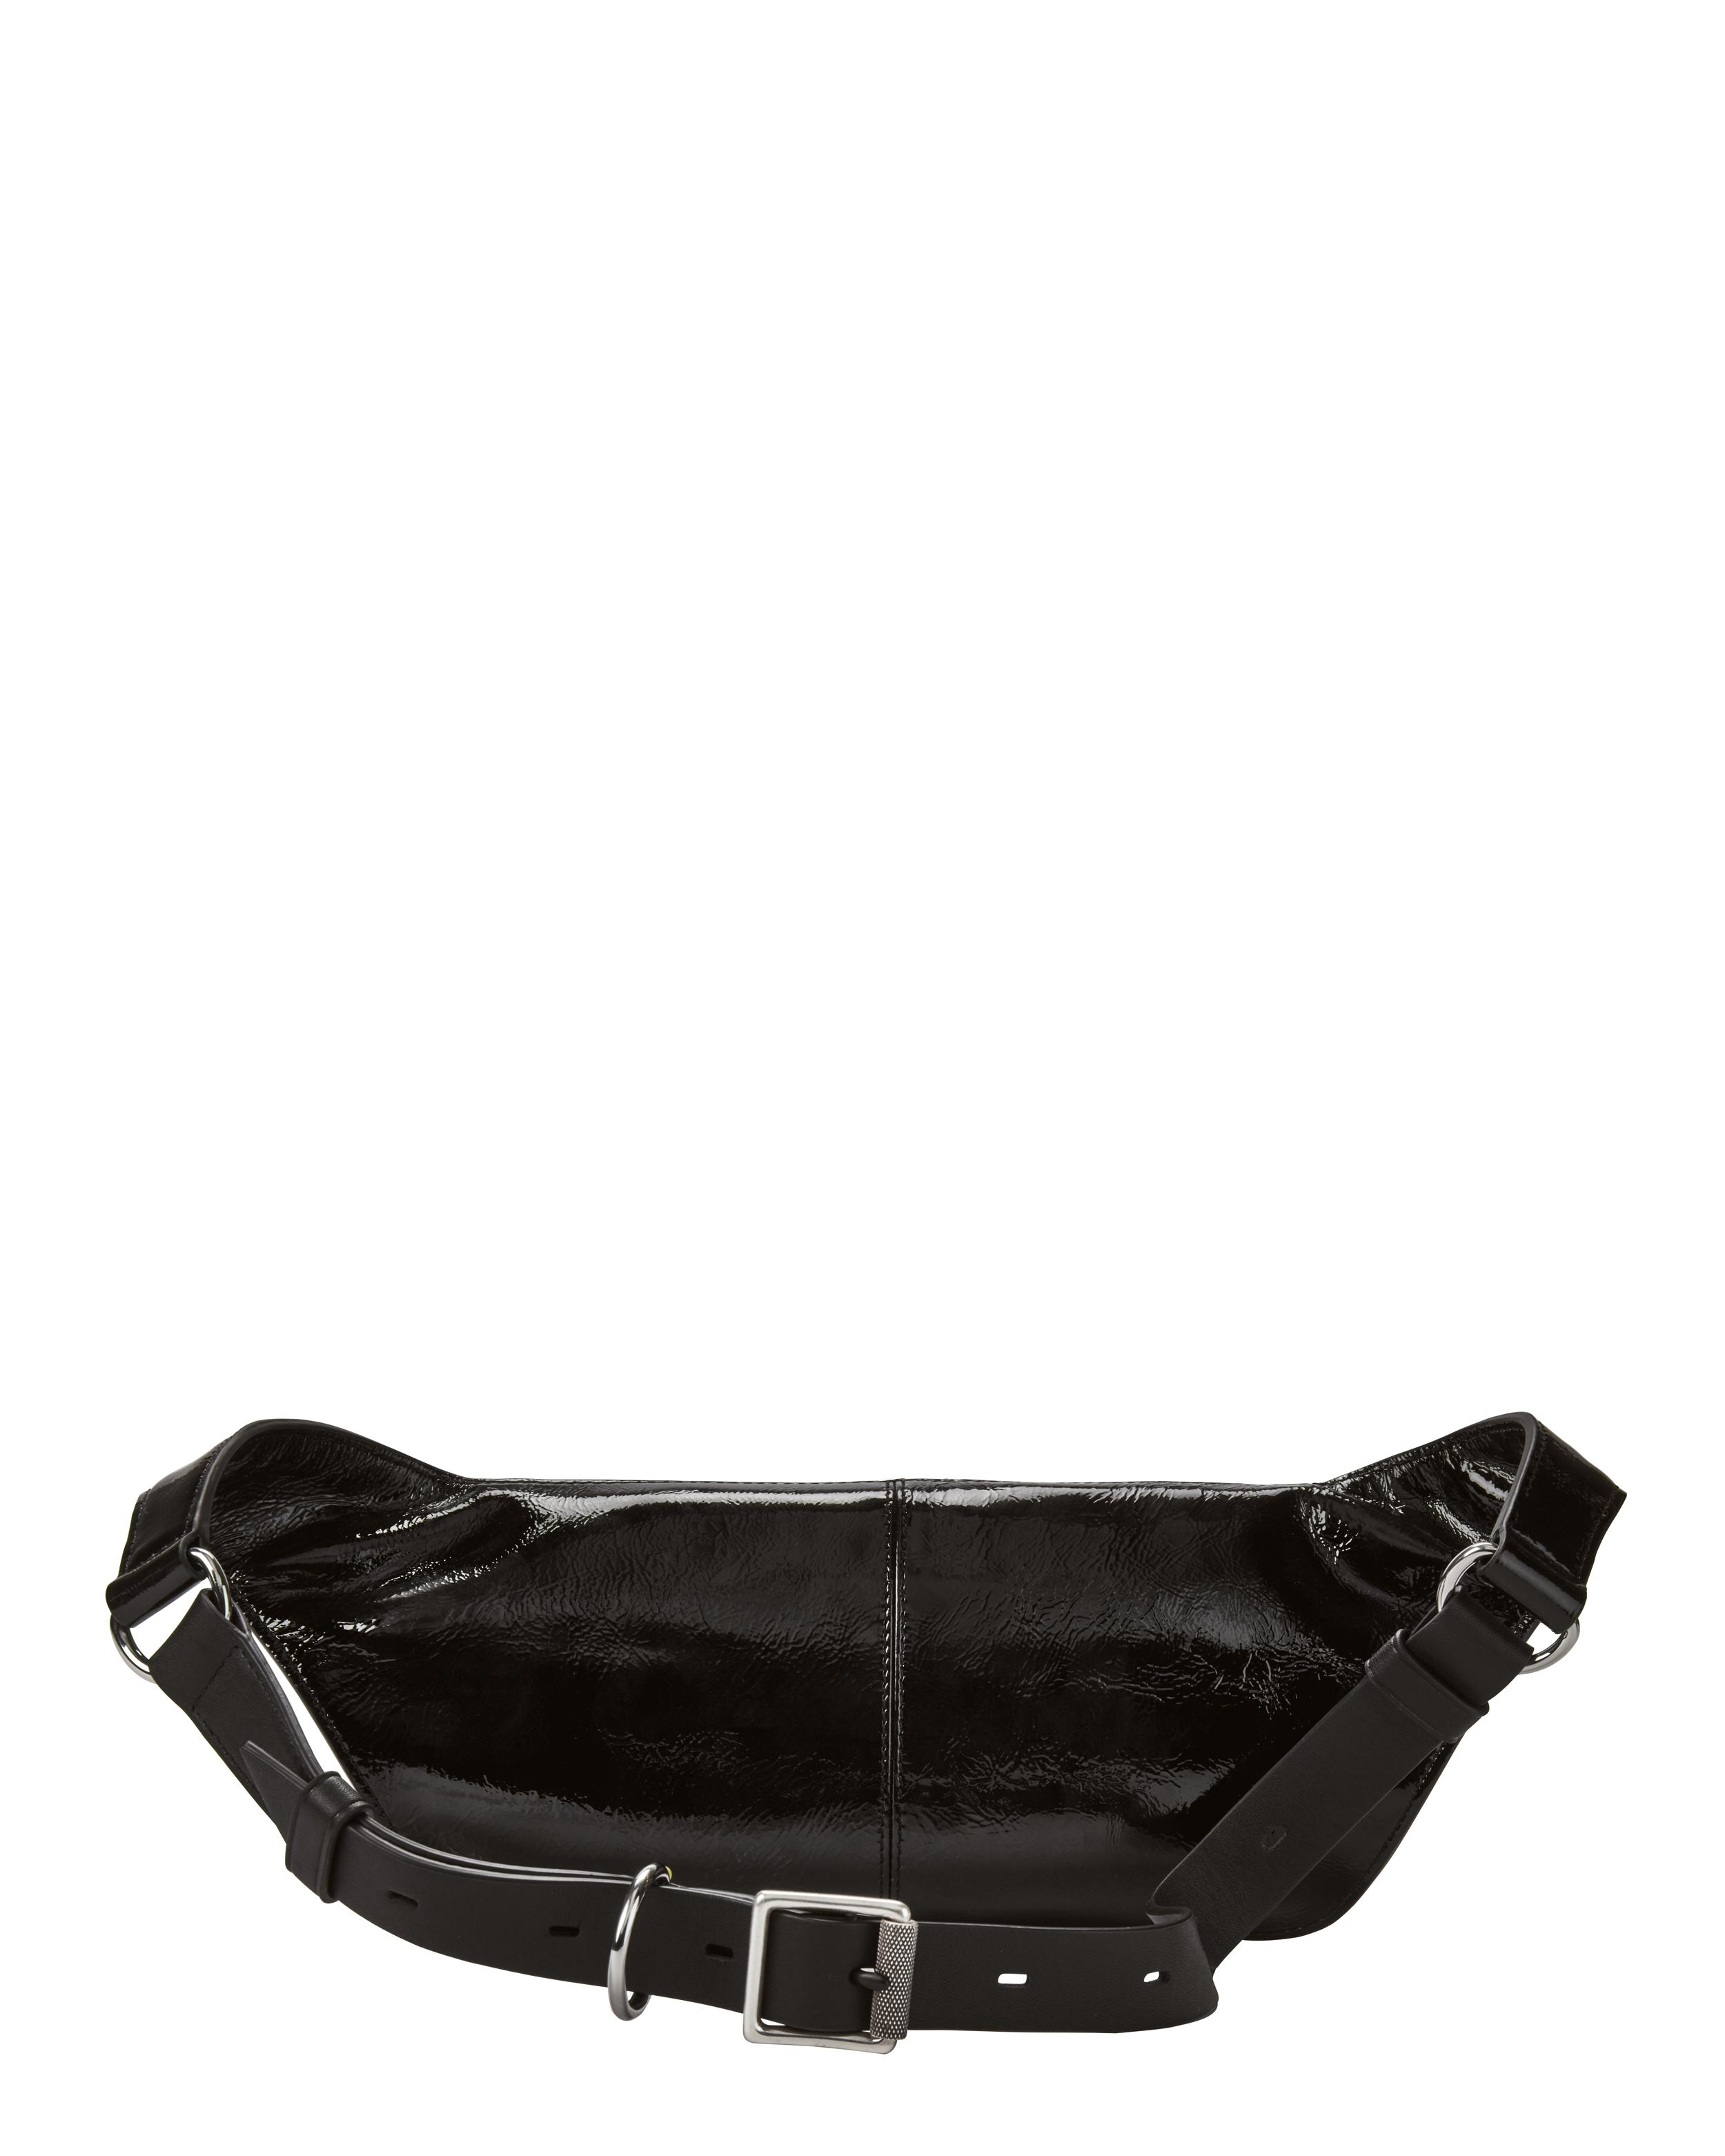 5878b254f Rag & Bone Small Patent Leather Fanny Pack in Black - Lyst